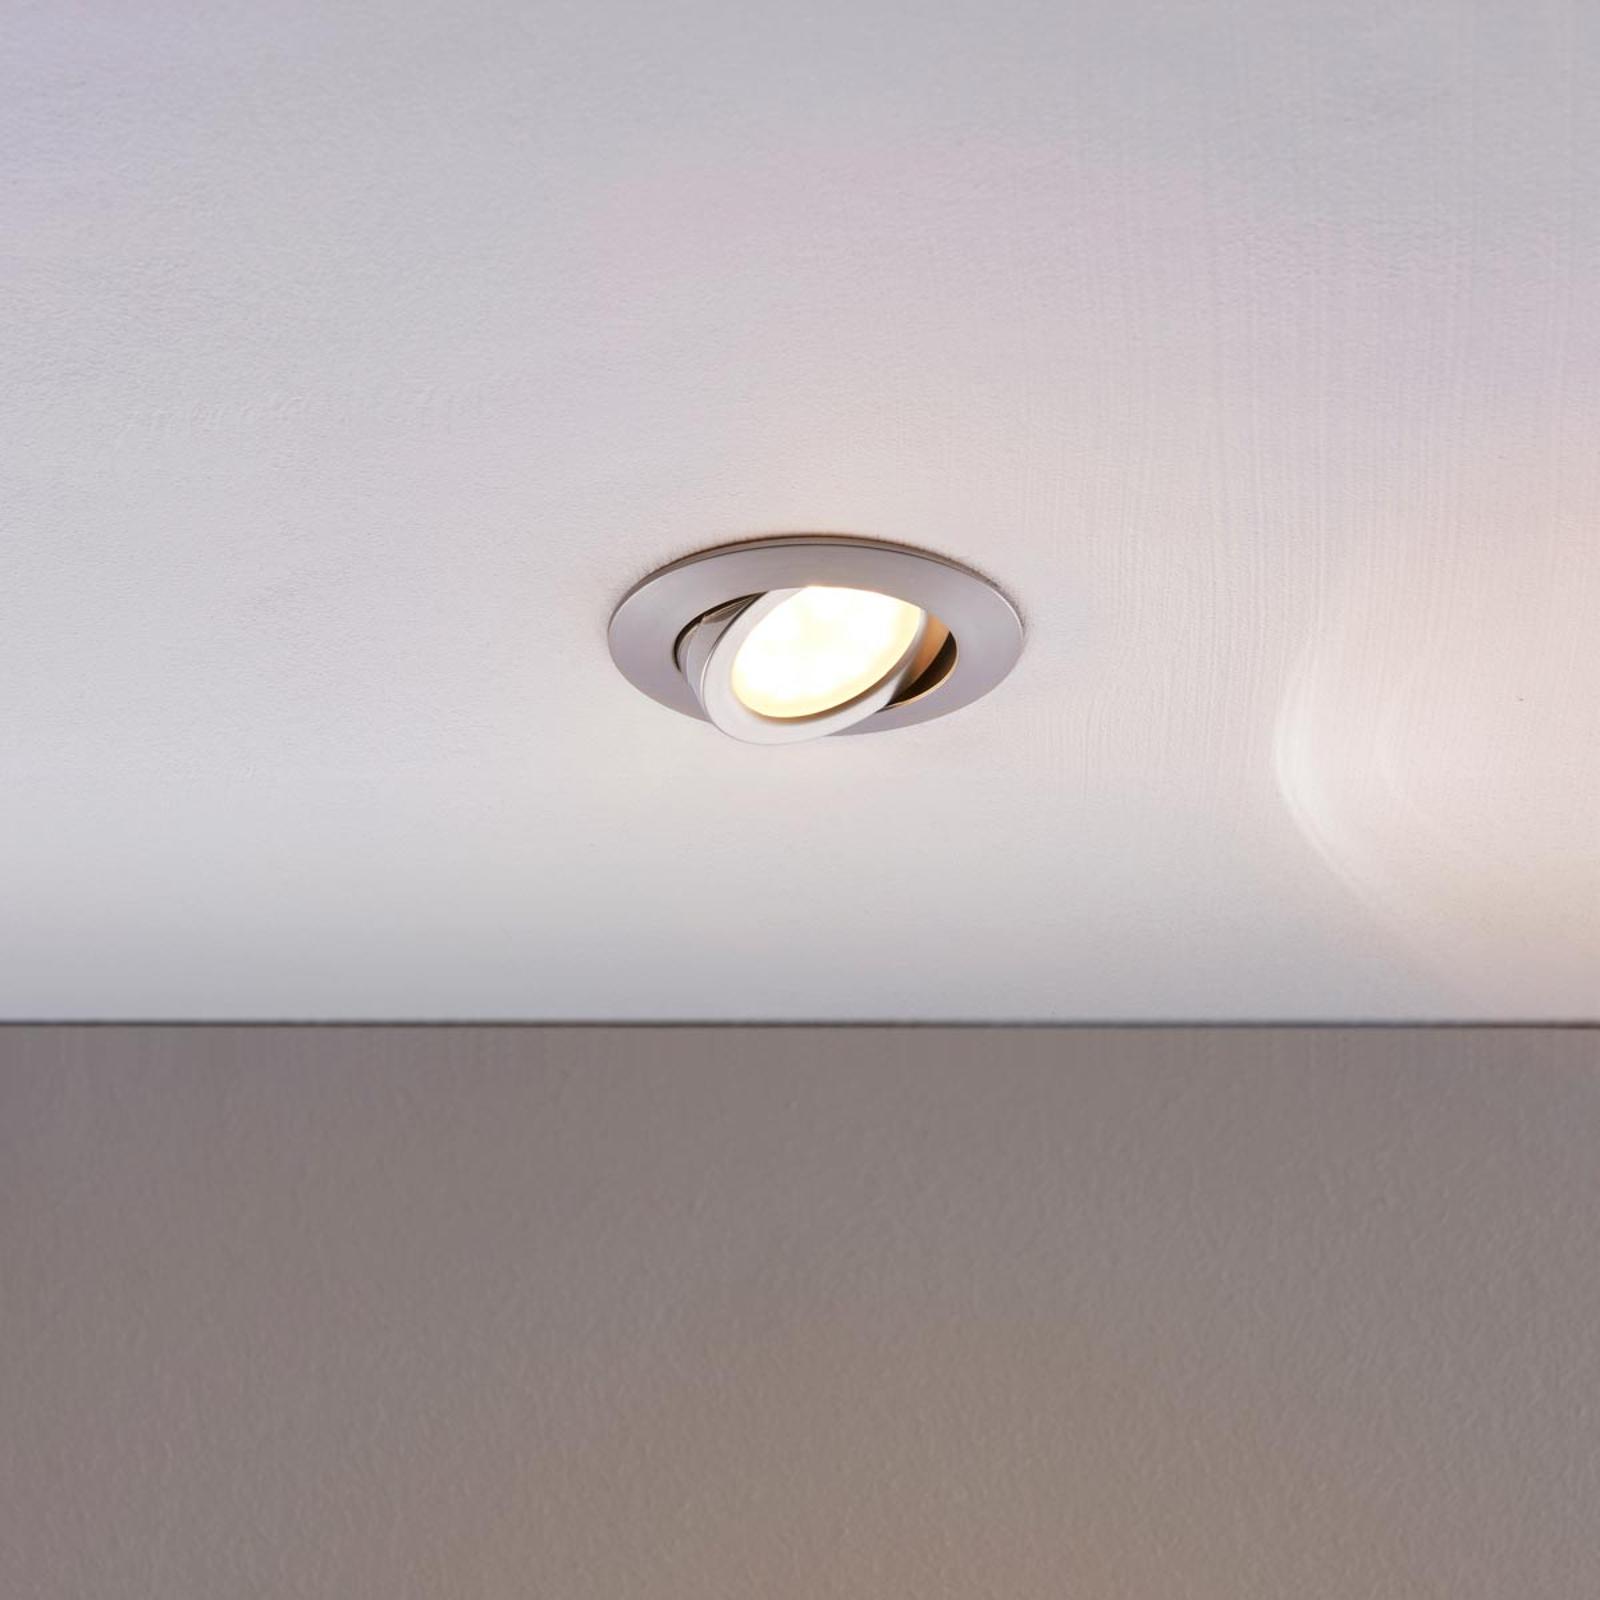 Spot encastré LED Andrej, rond, aluminium